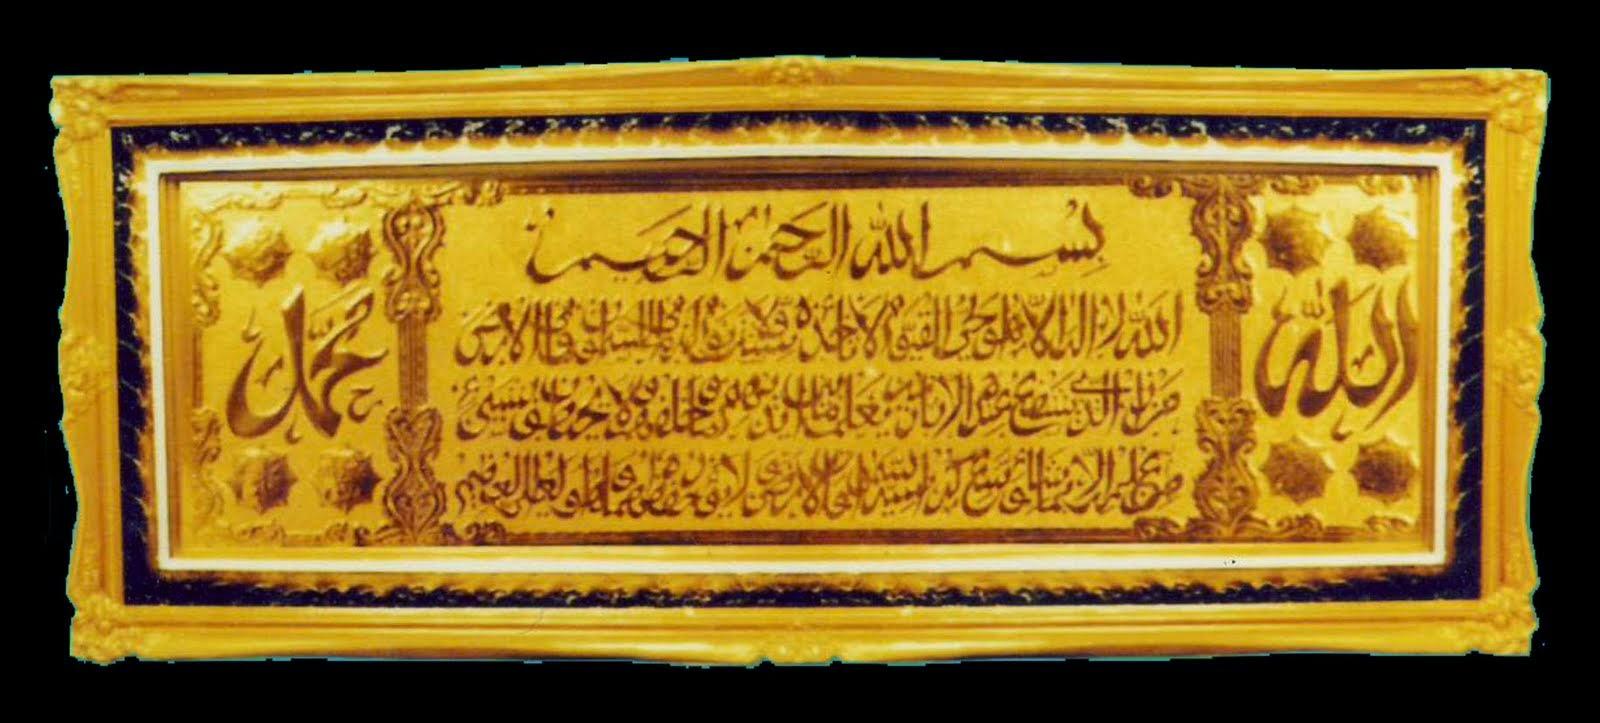 Gambar Lukisan Kaligrafi Ayat Kursi Emas Tulisan Arab Asma Allah